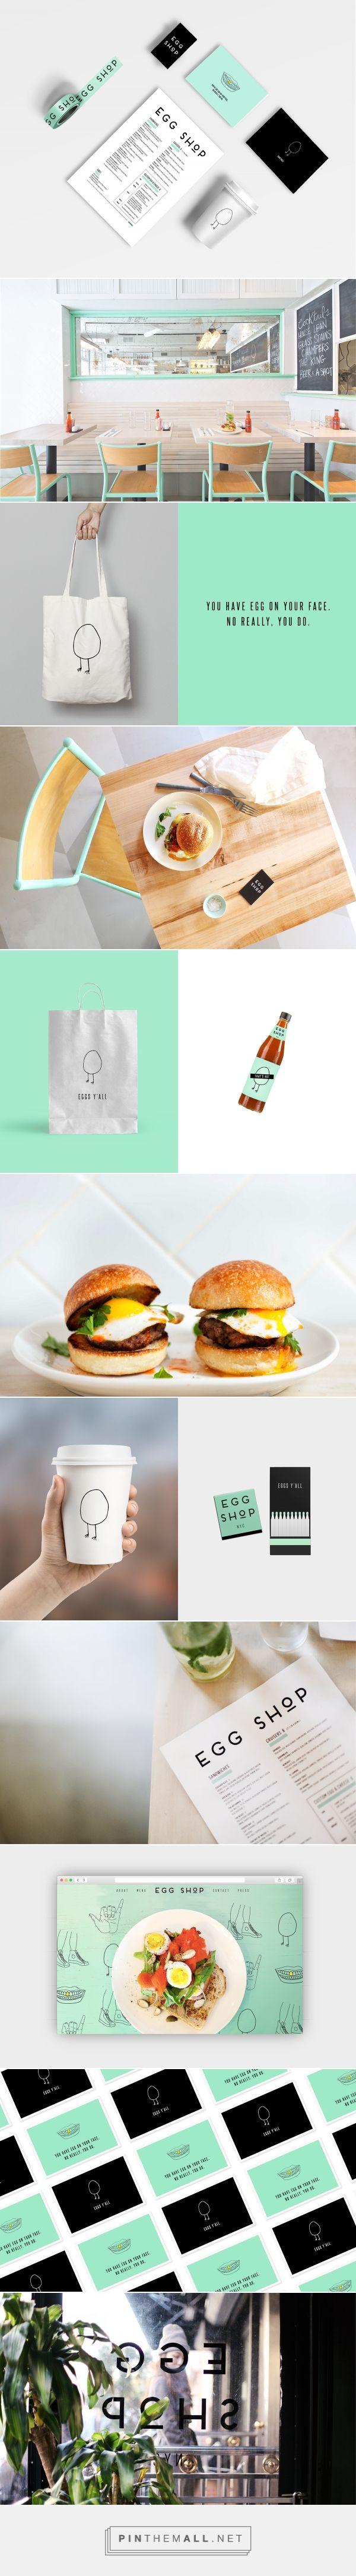 Egg Shop Nyc Restaurant Branding by Katie Minchak   Fivestar Branding Agency – Design and Branding Agency & Curated Inspiration Gallery